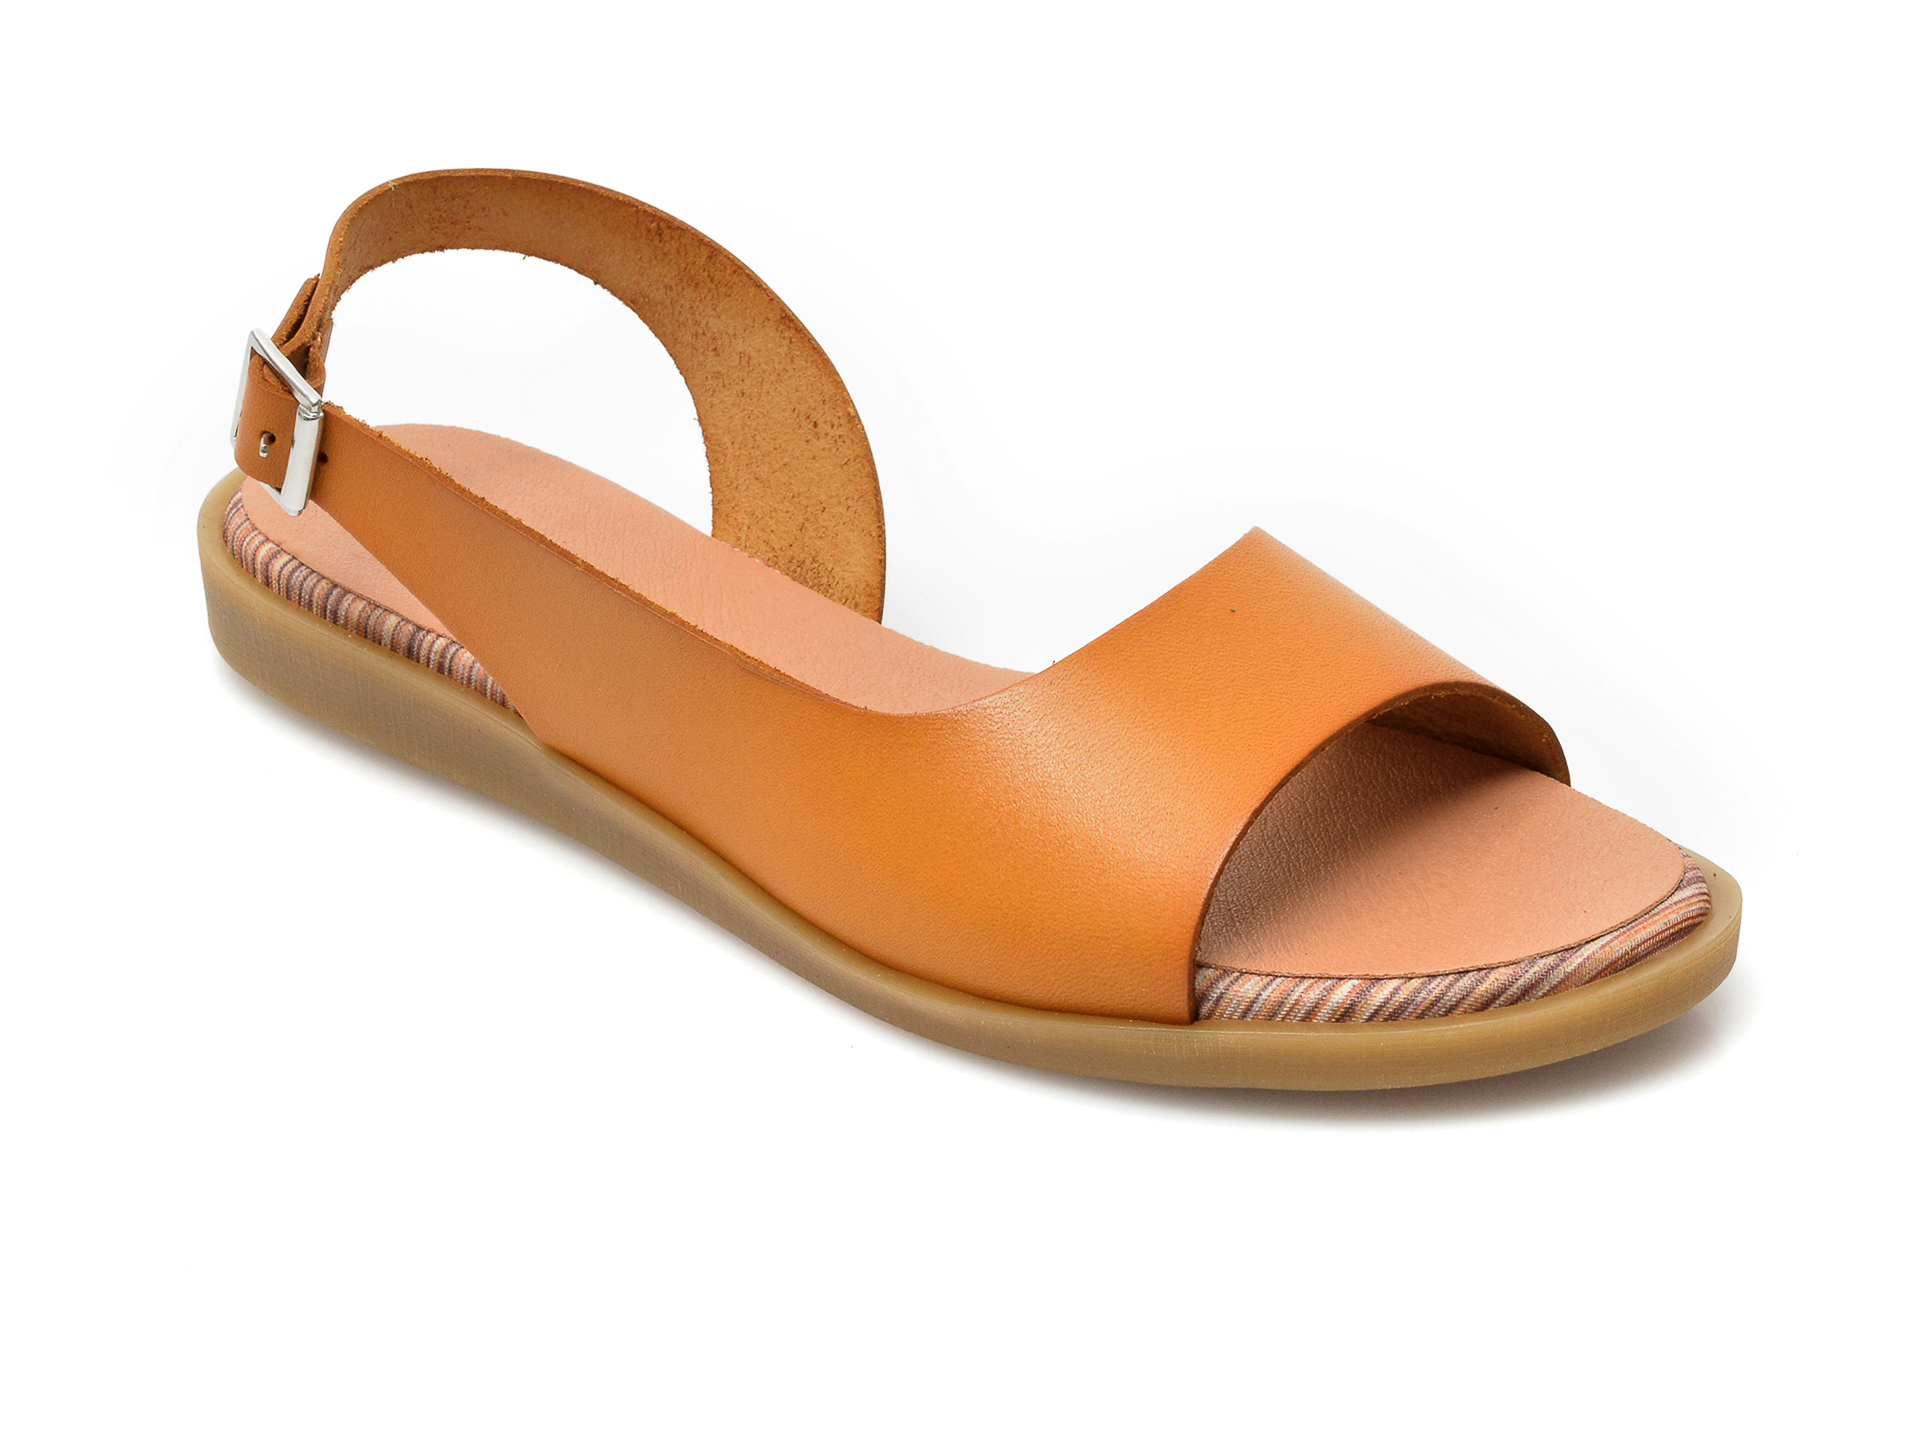 Sandale IMAGE galbene, 1323, din piele naturala imagine otter.ro 2021